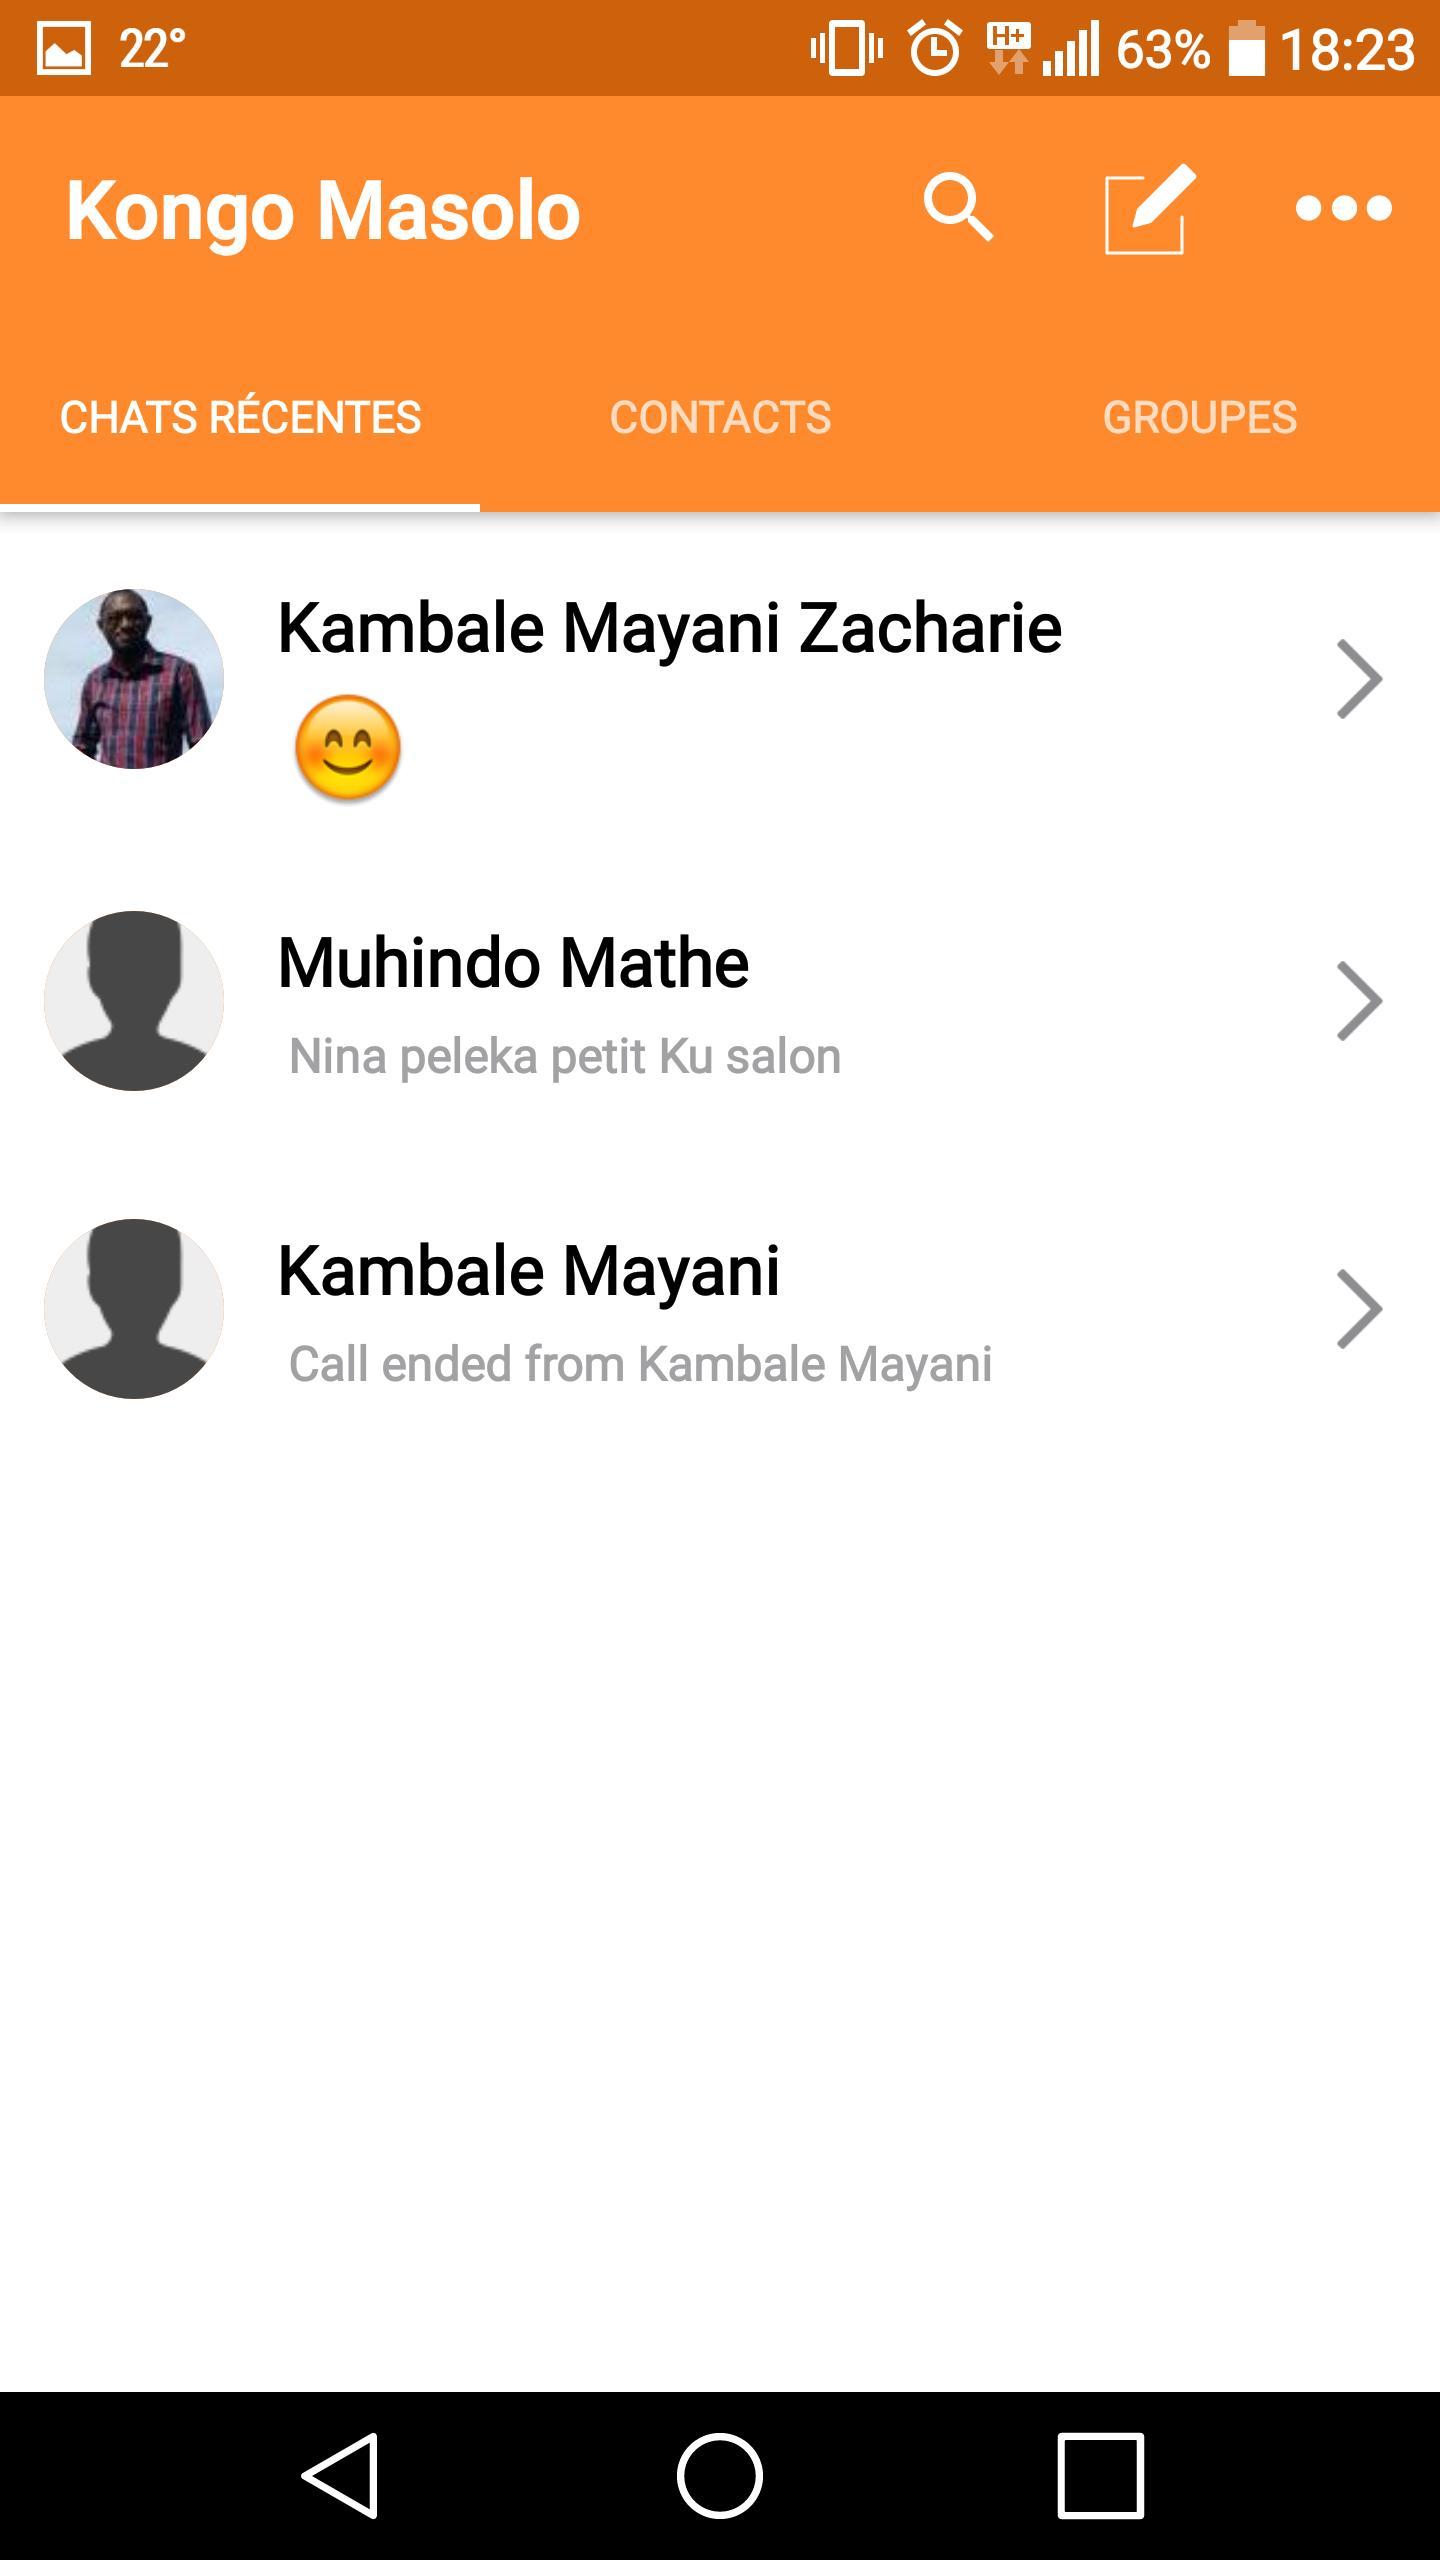 Kongo Masolo poster